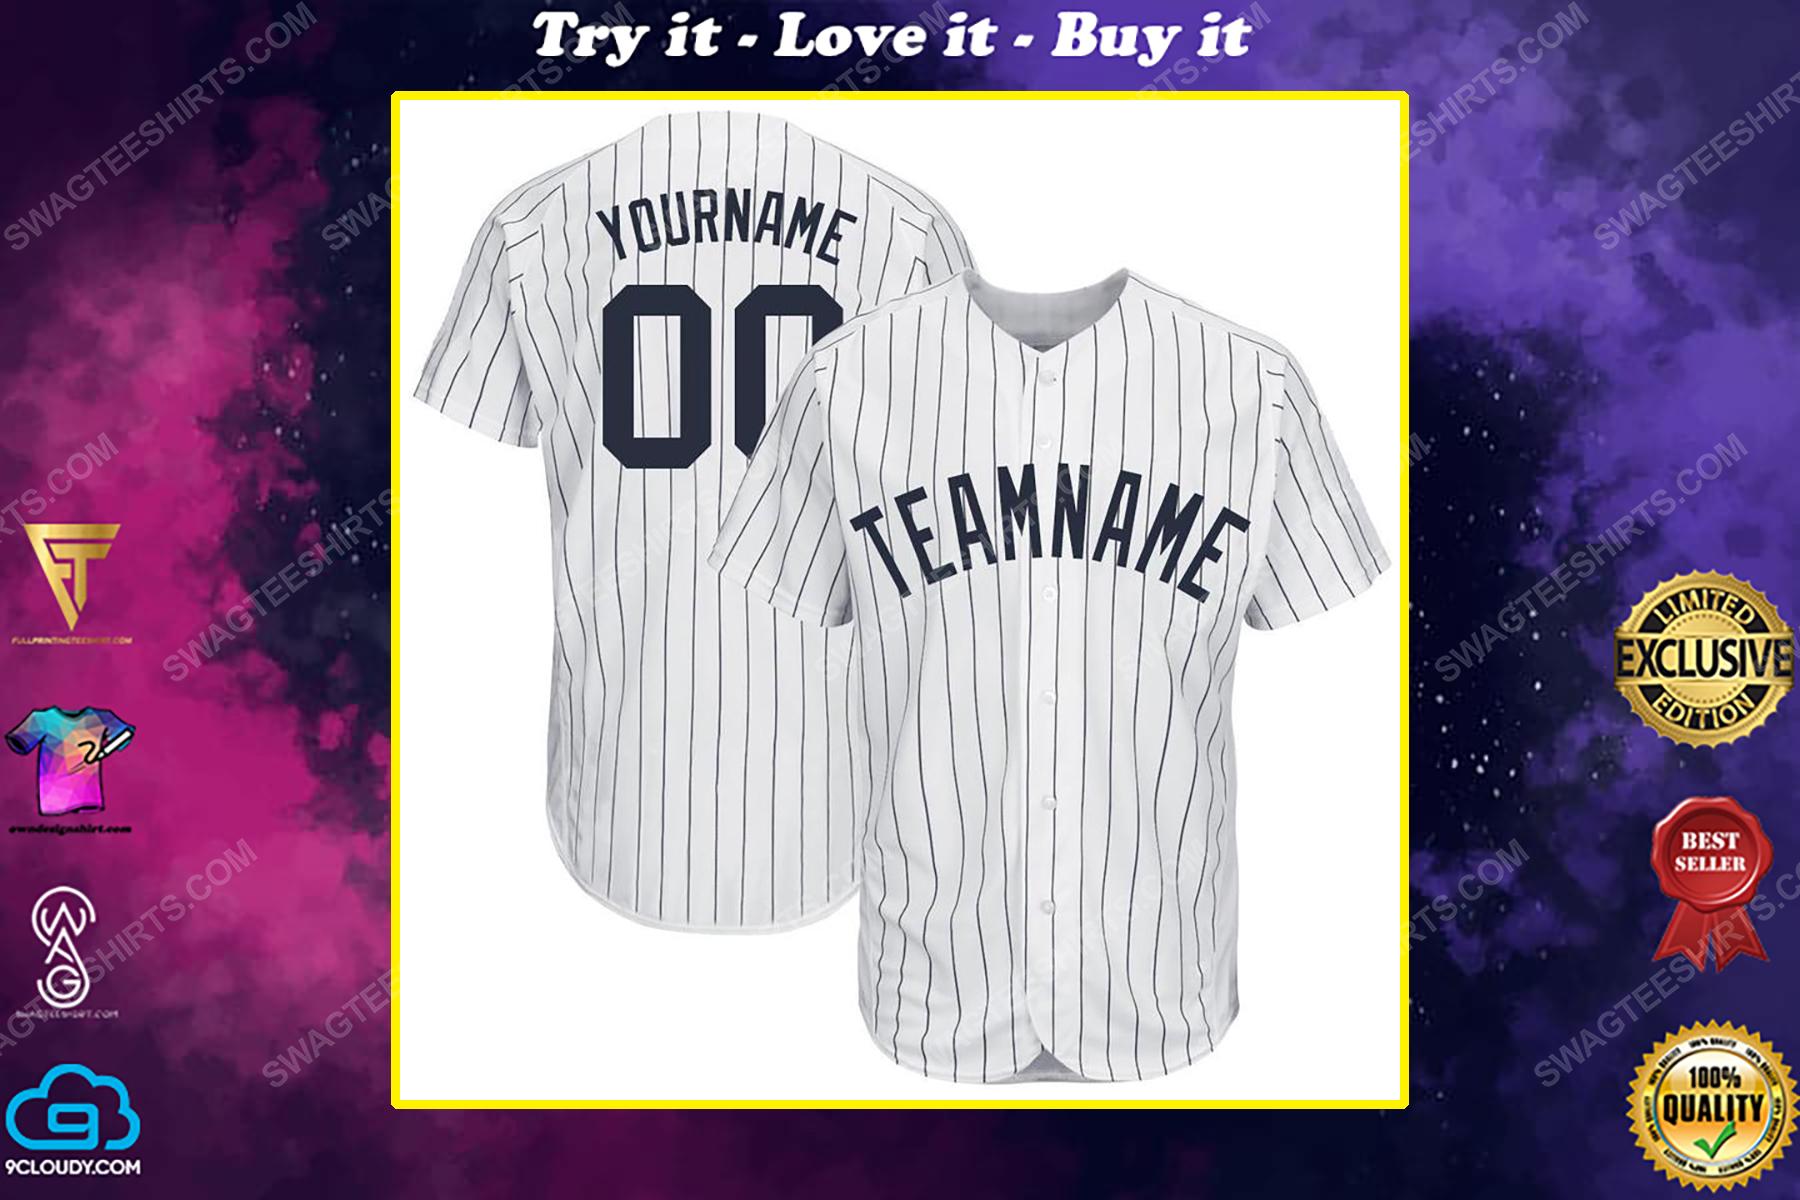 Custom team name new york yankees mlb full printed baseball jersey